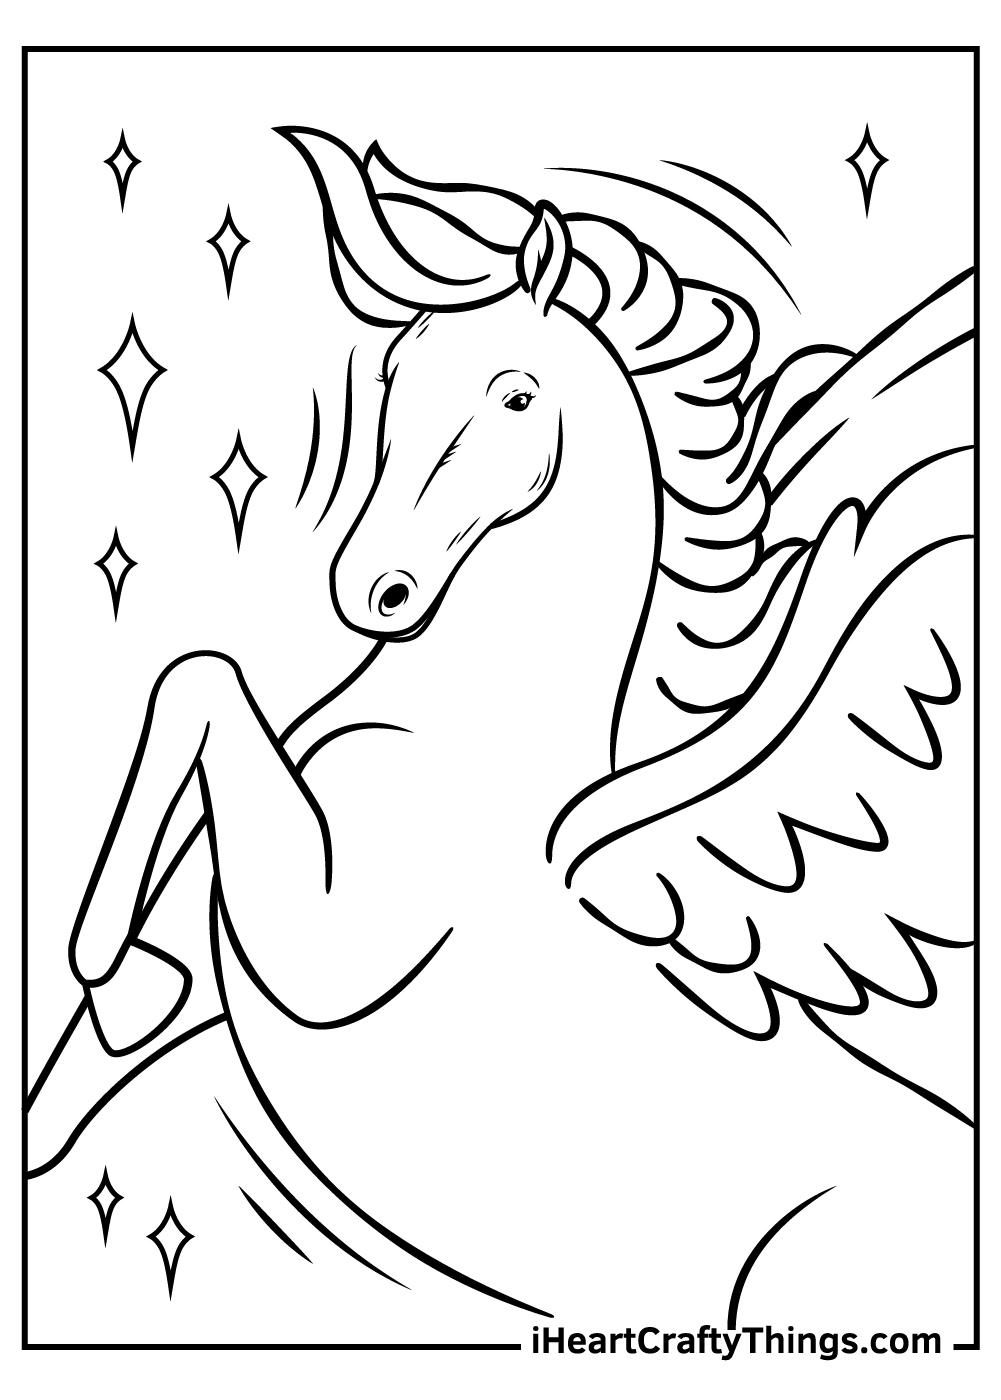 Pegasus mythology coloring pages